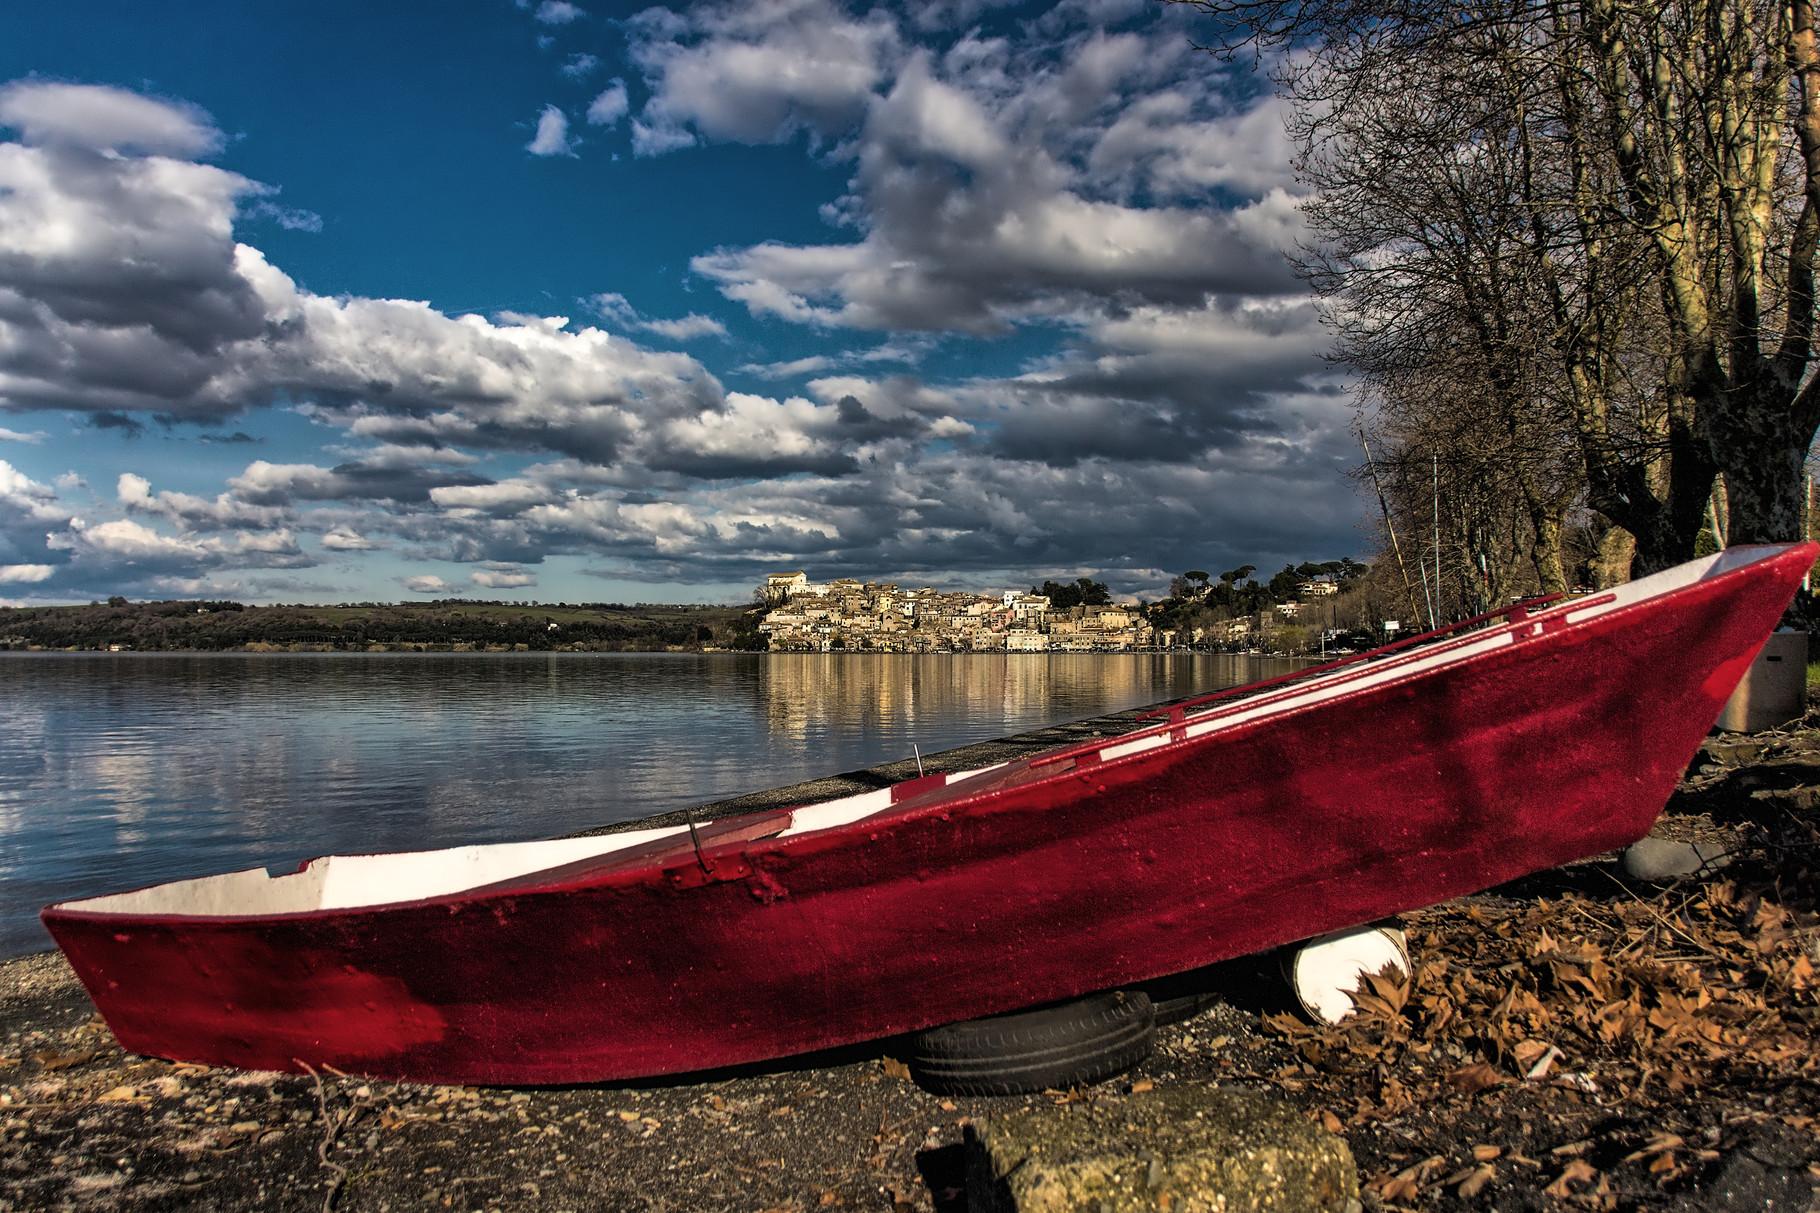 08_Bracciano Lake.